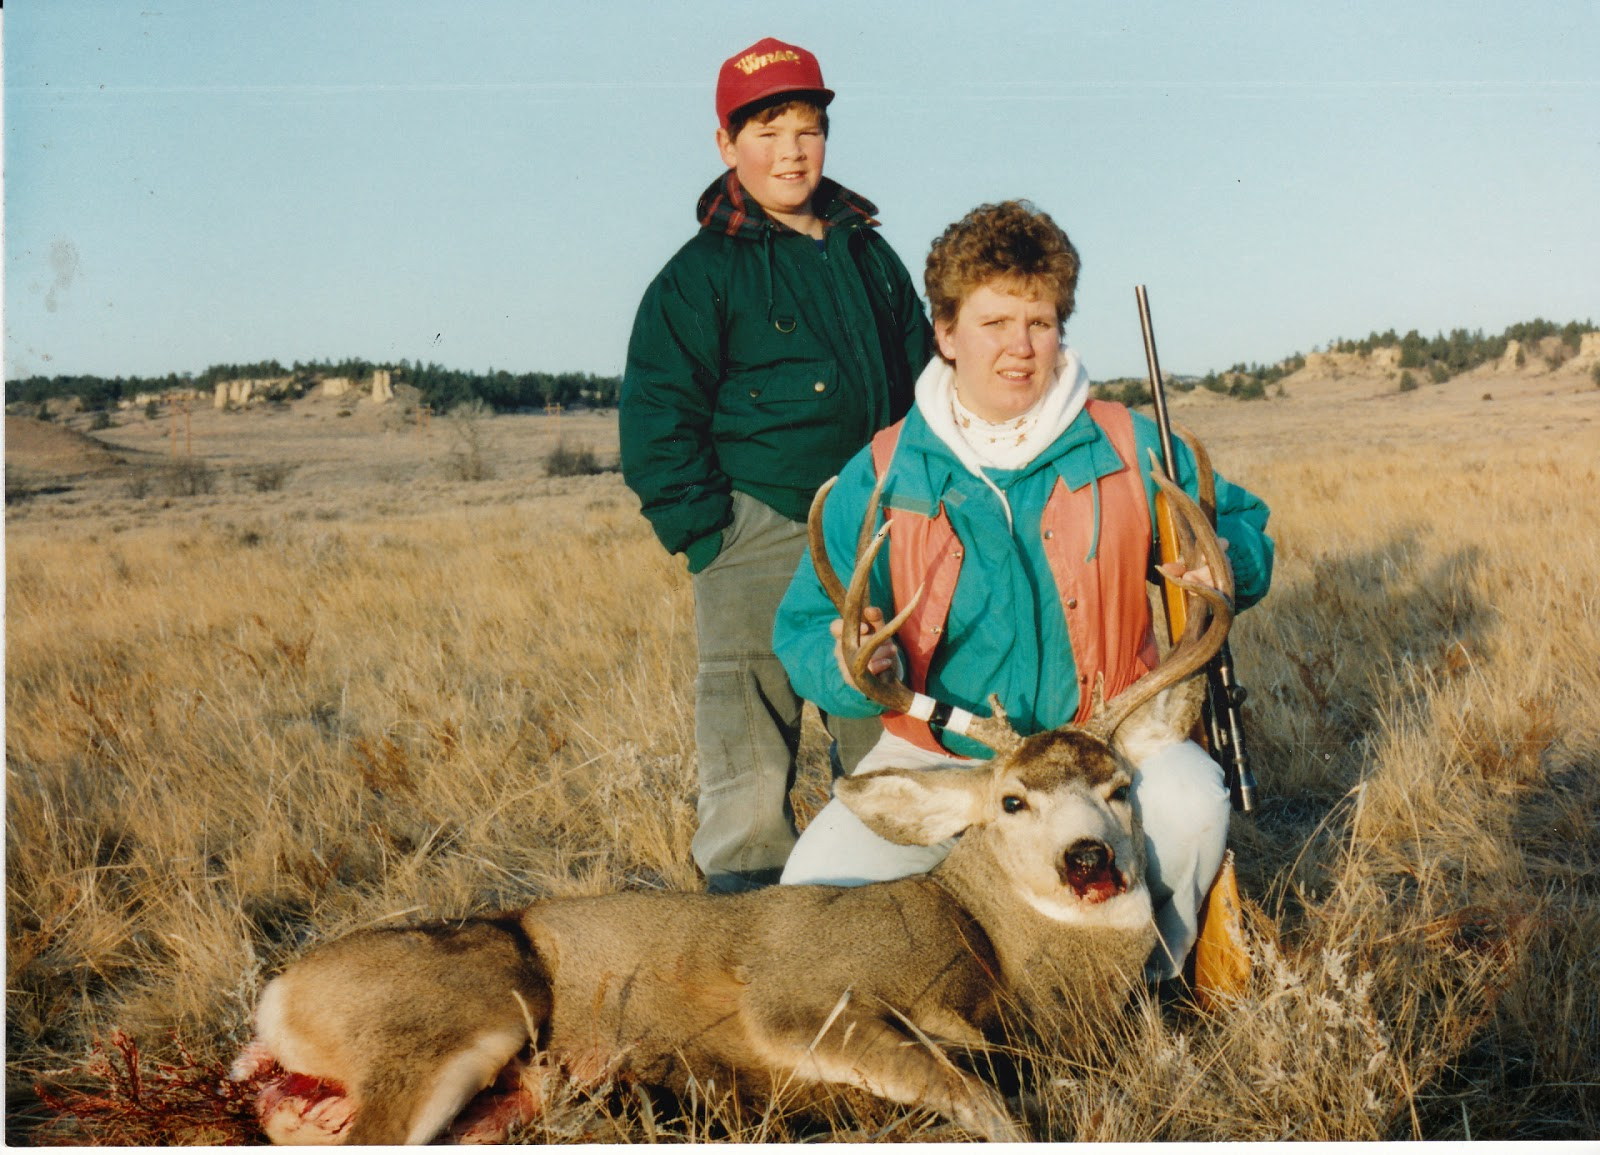 The Greatest Mule Deer Hunter: My Montana Hunt 2014